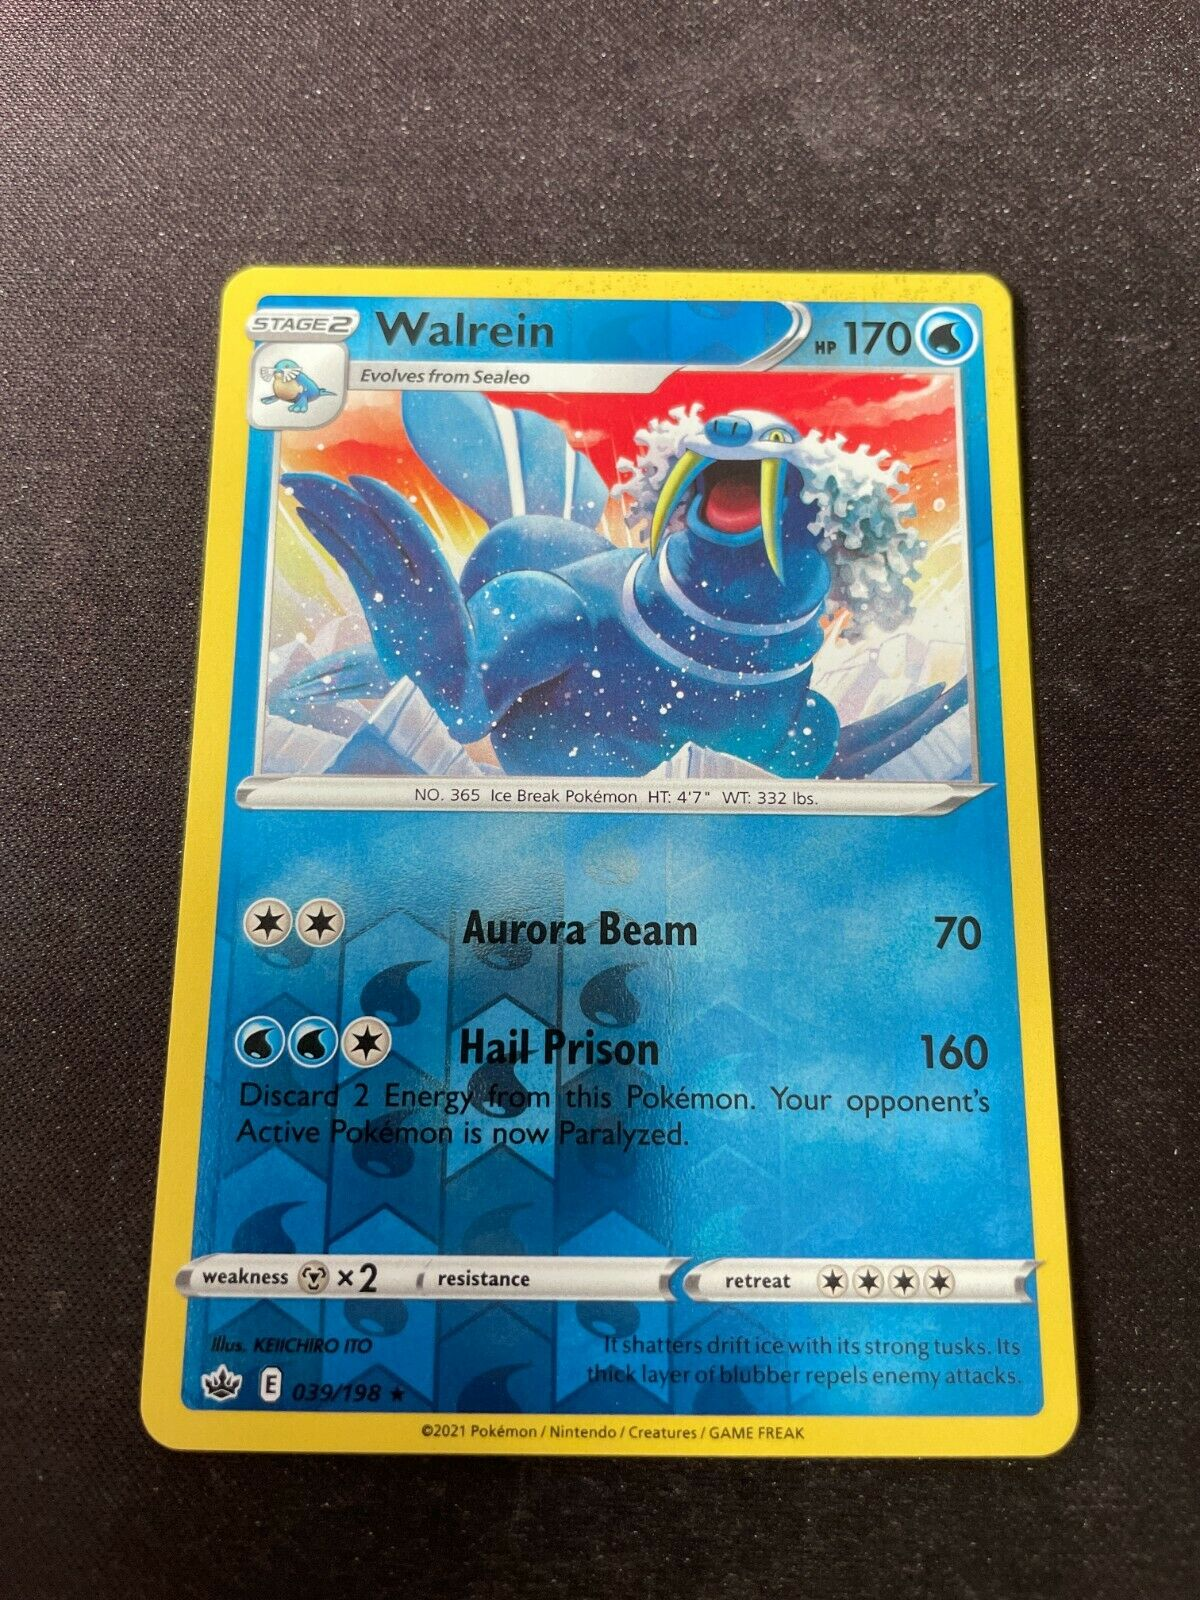 Pokemon TCG Chilling Reign 039/198 Walrein Card Fresh Reverse Holo Mint Rare